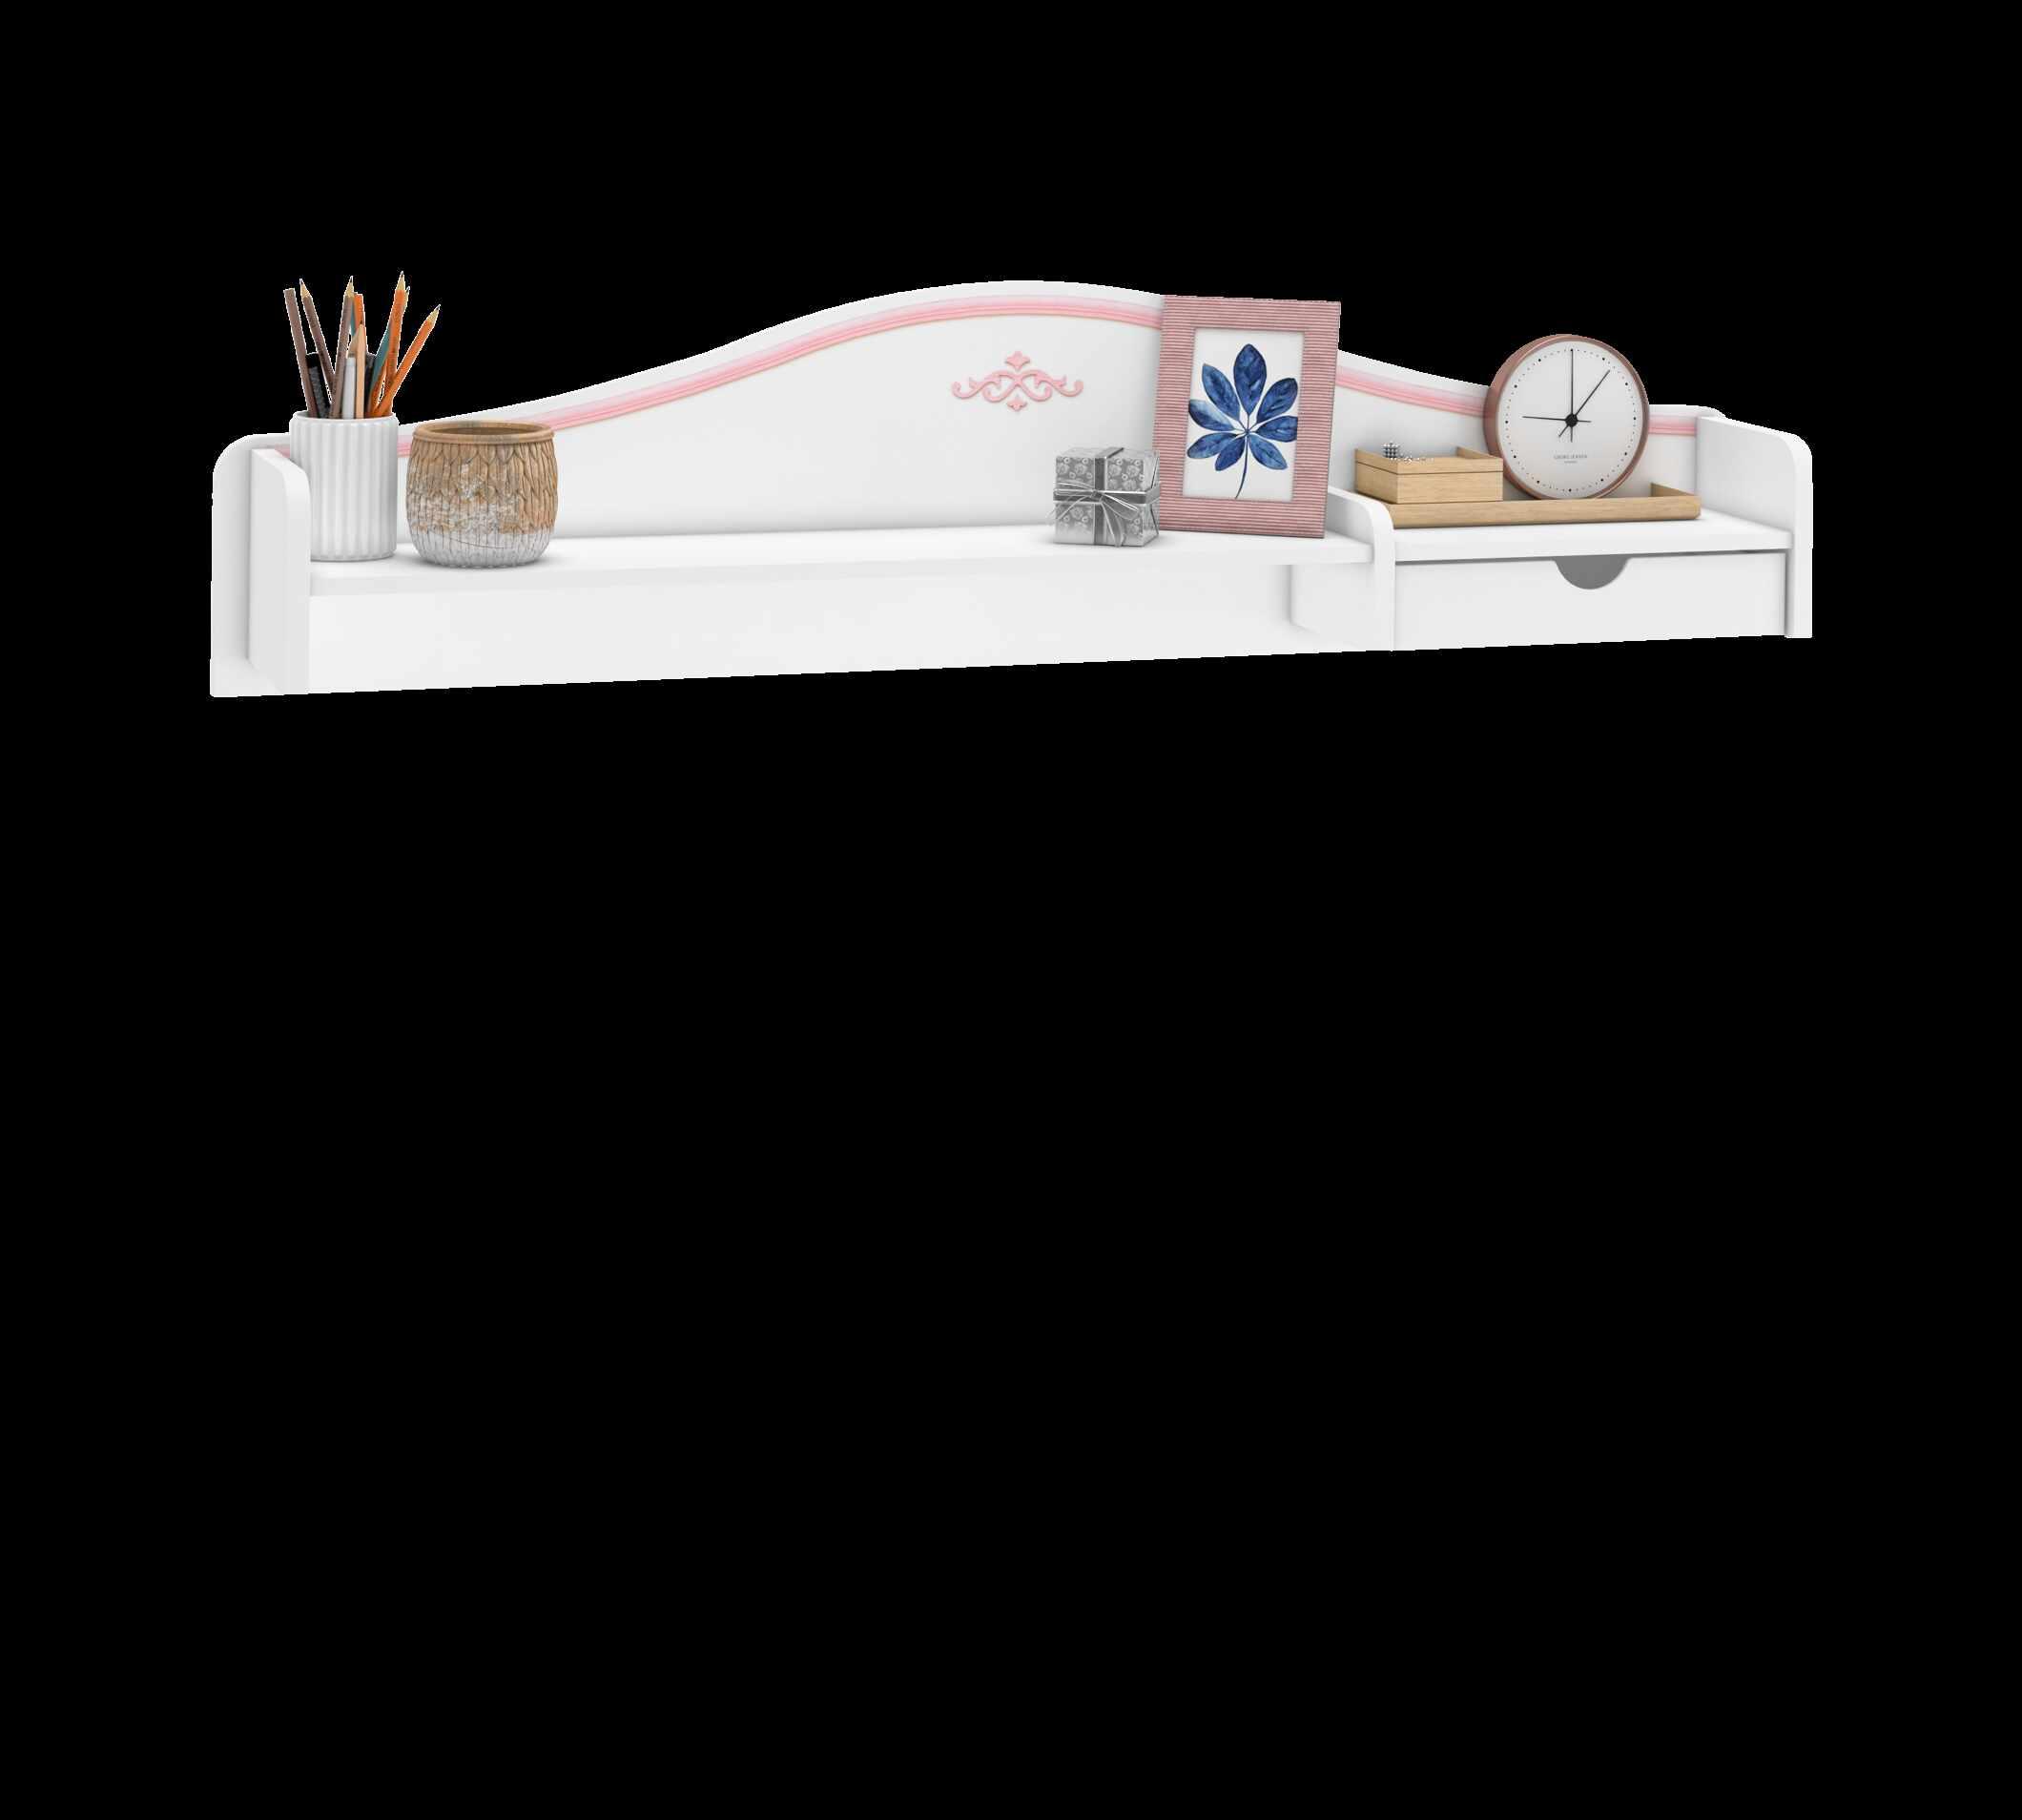 Etajera suspendata din pal, pentru tineret Selena Pink Alb / Roz, l120xA18xH33 cm la pret 242 lei